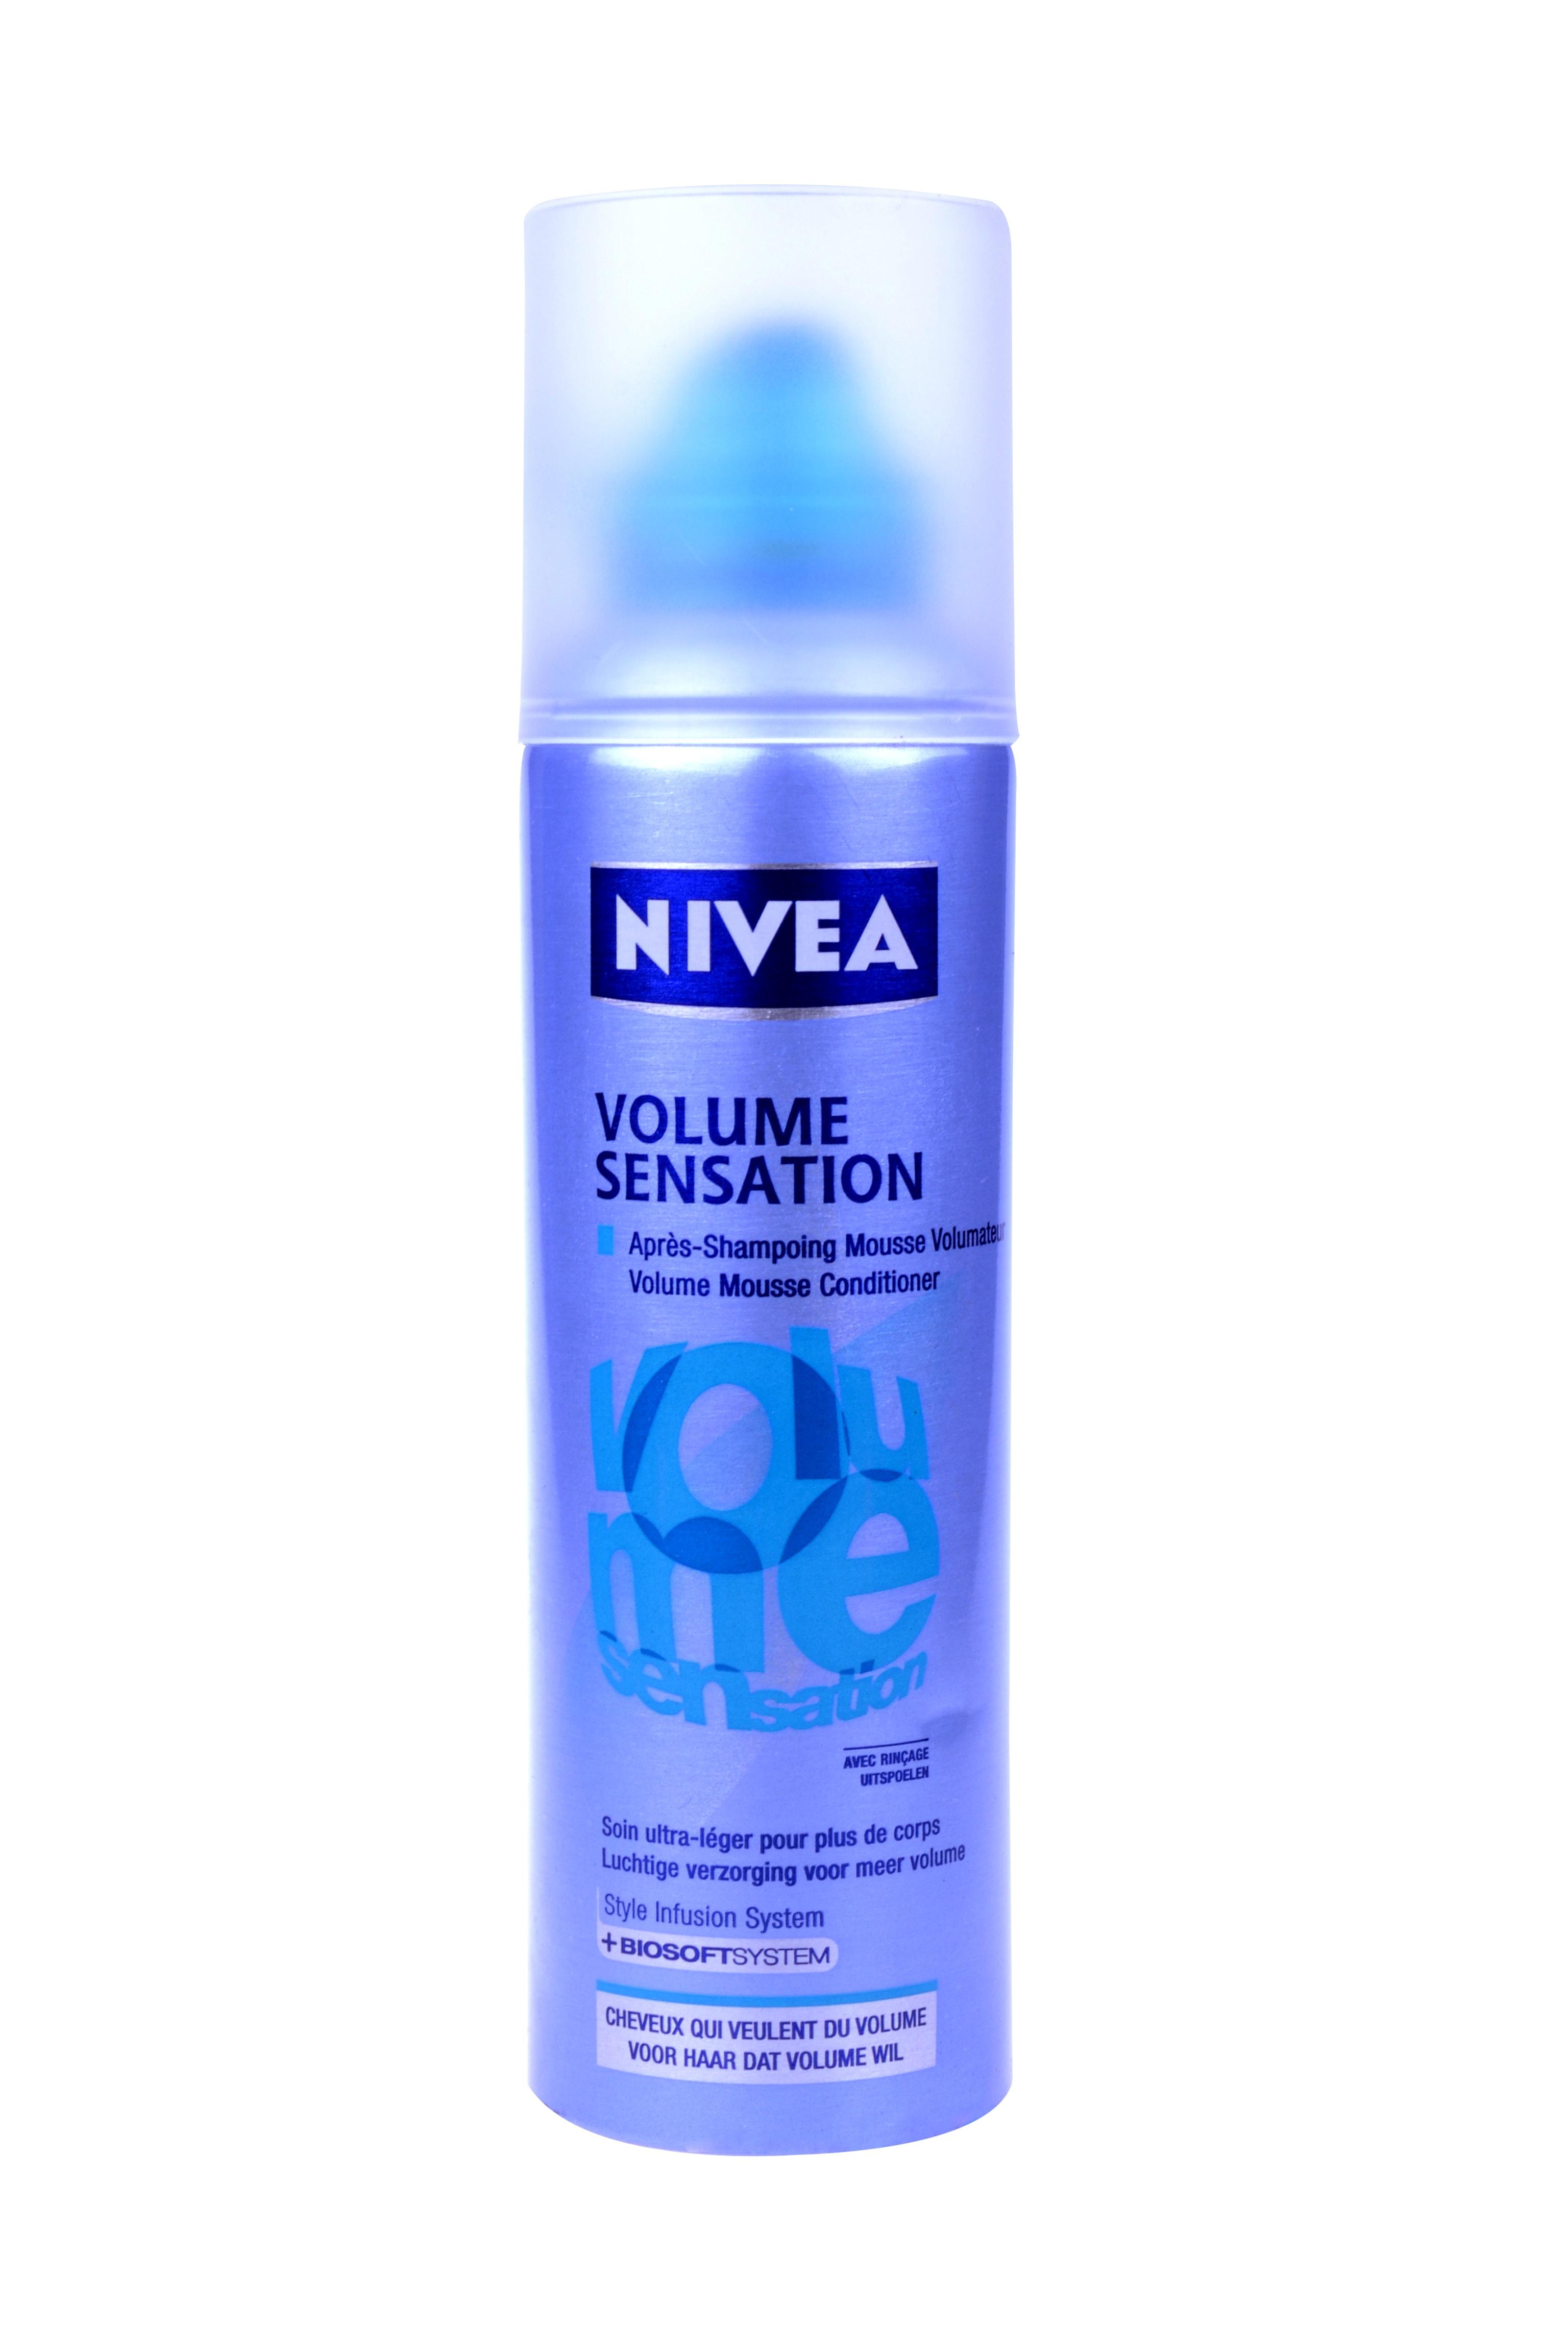 mousse Conditioner volume sensation 200 ml